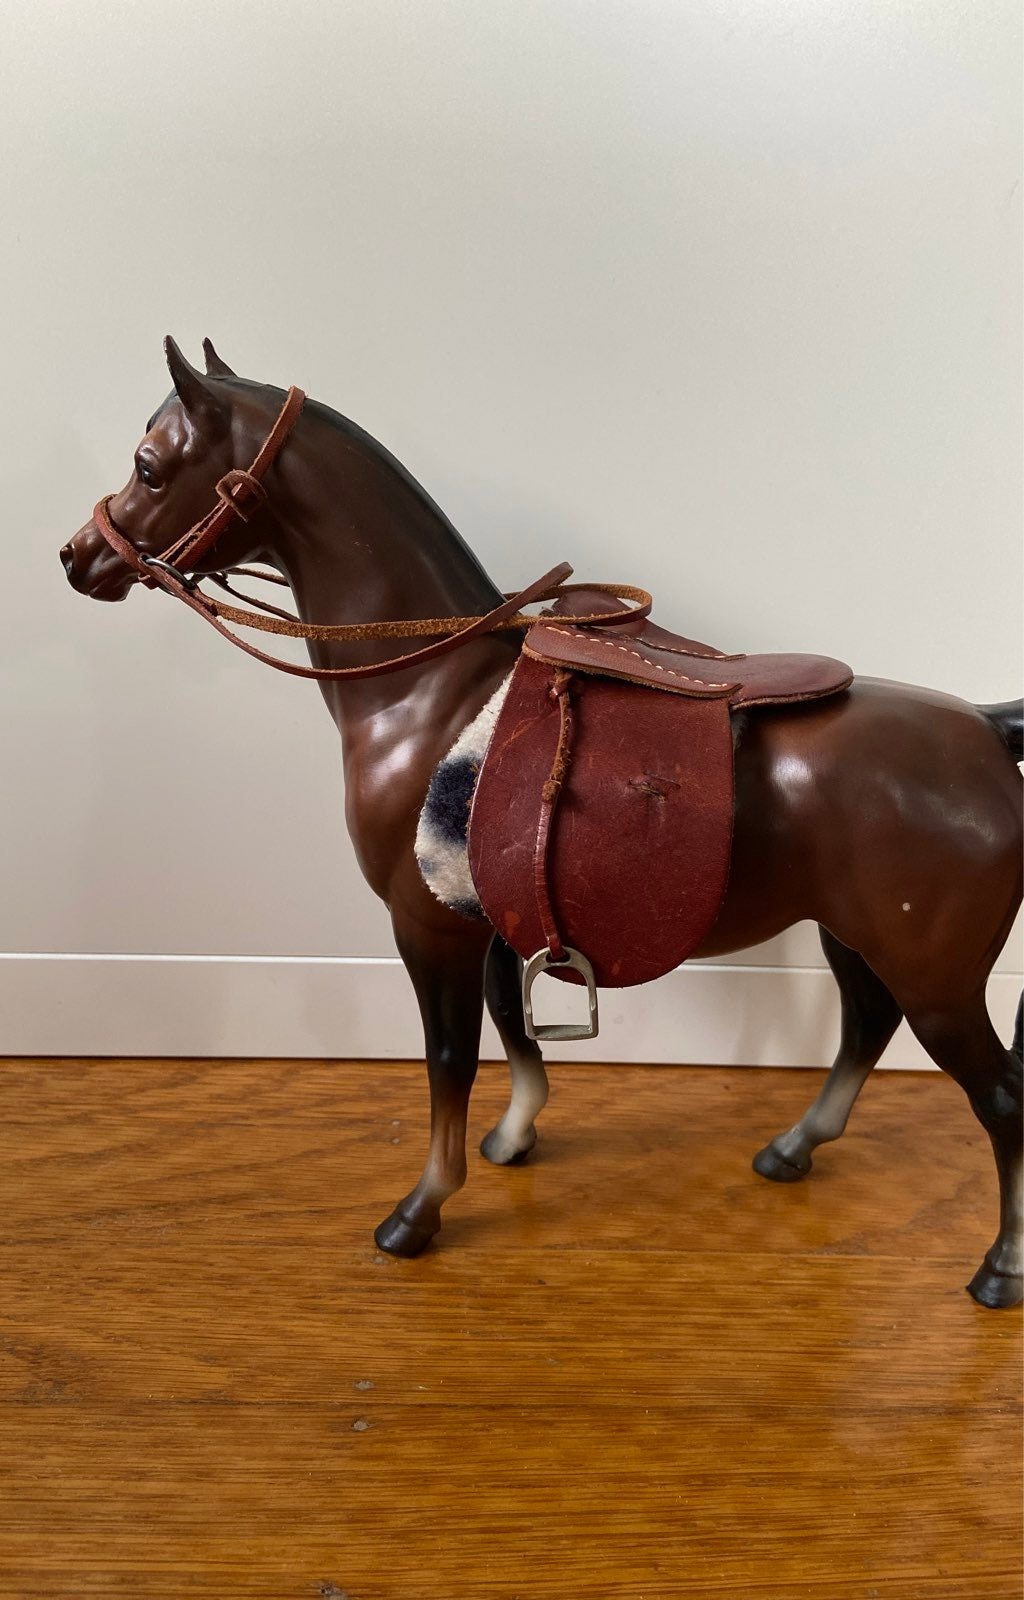 Saddle, bridle, and saddle pad